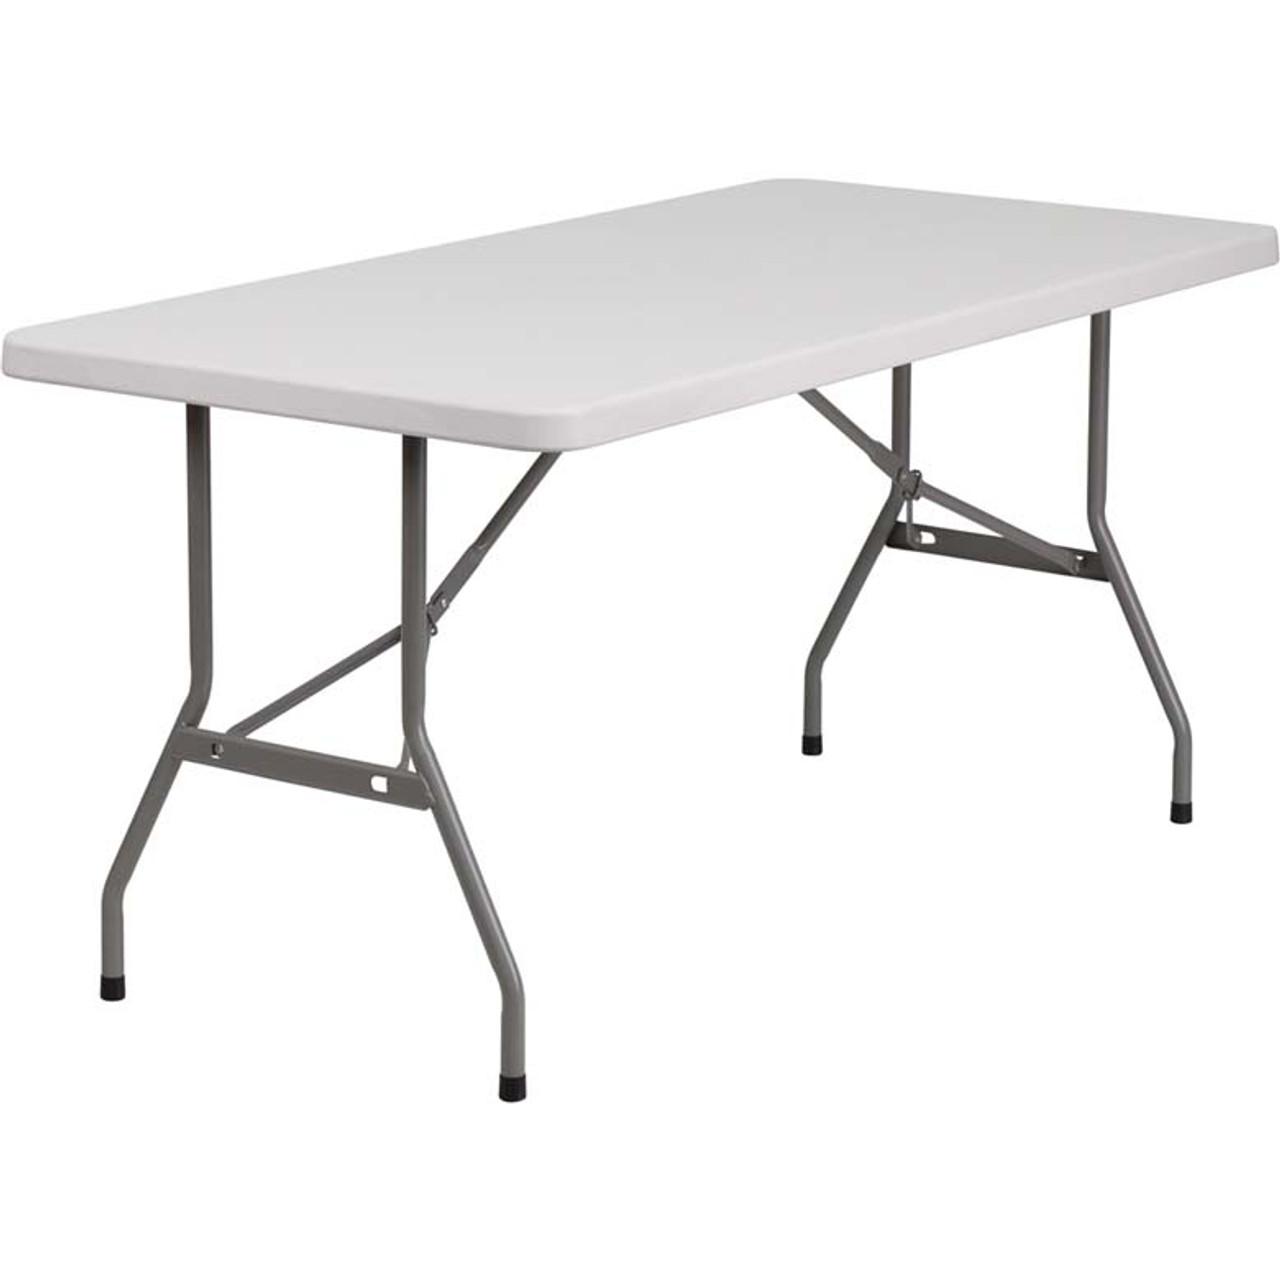 - 5 Ft Lightweight Plastic Folding Table [RB-3060-GG